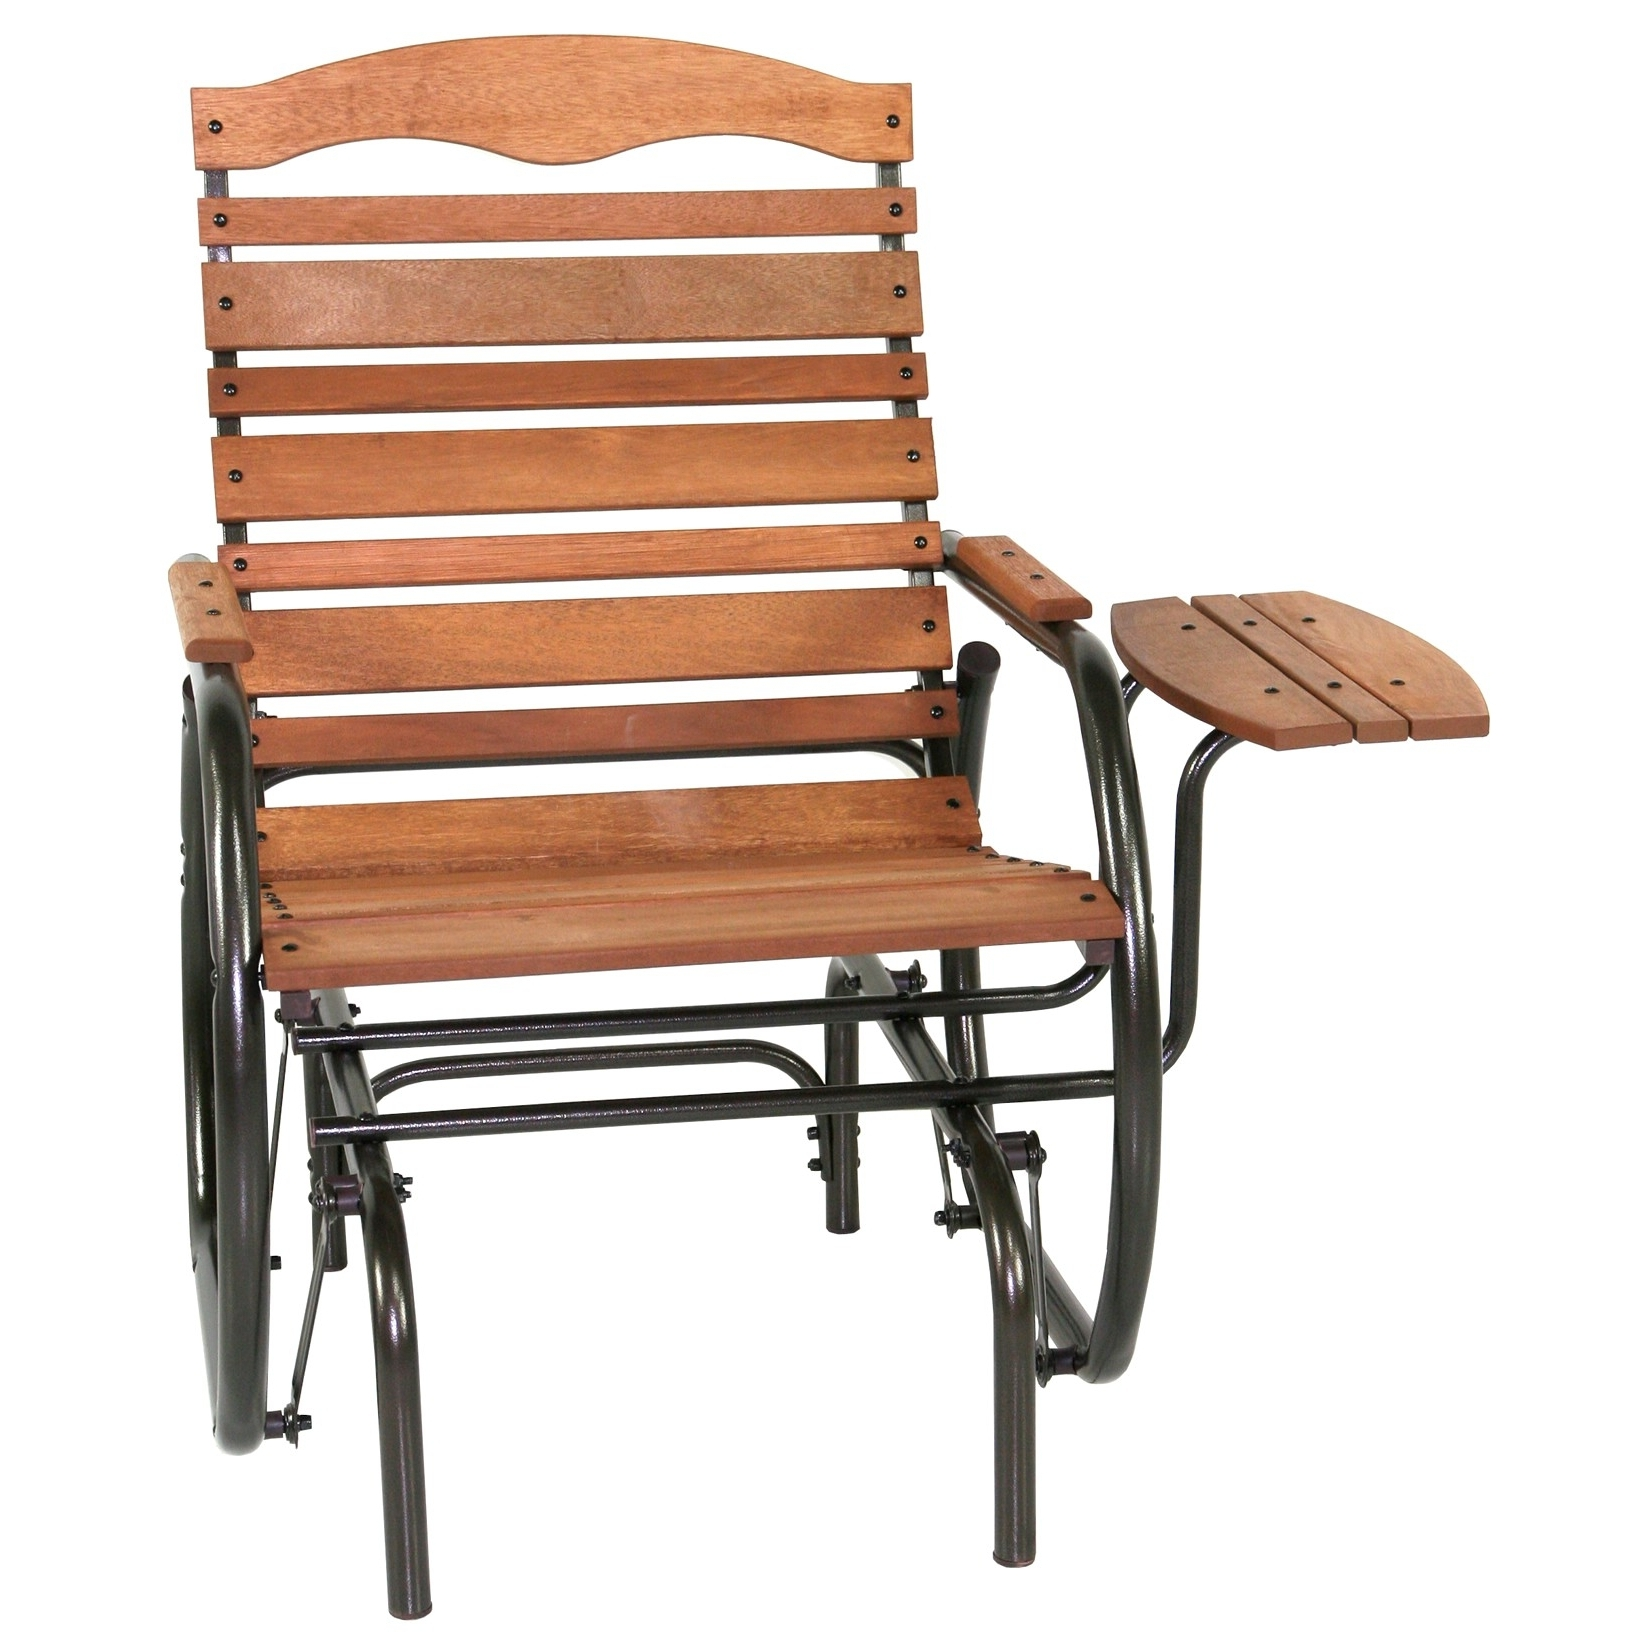 Favorite Outdoor Furniture Sets Target Elegant Tar Rocking Chair Baby In Within Rocking Chairs At Wayfair (View 6 of 20)